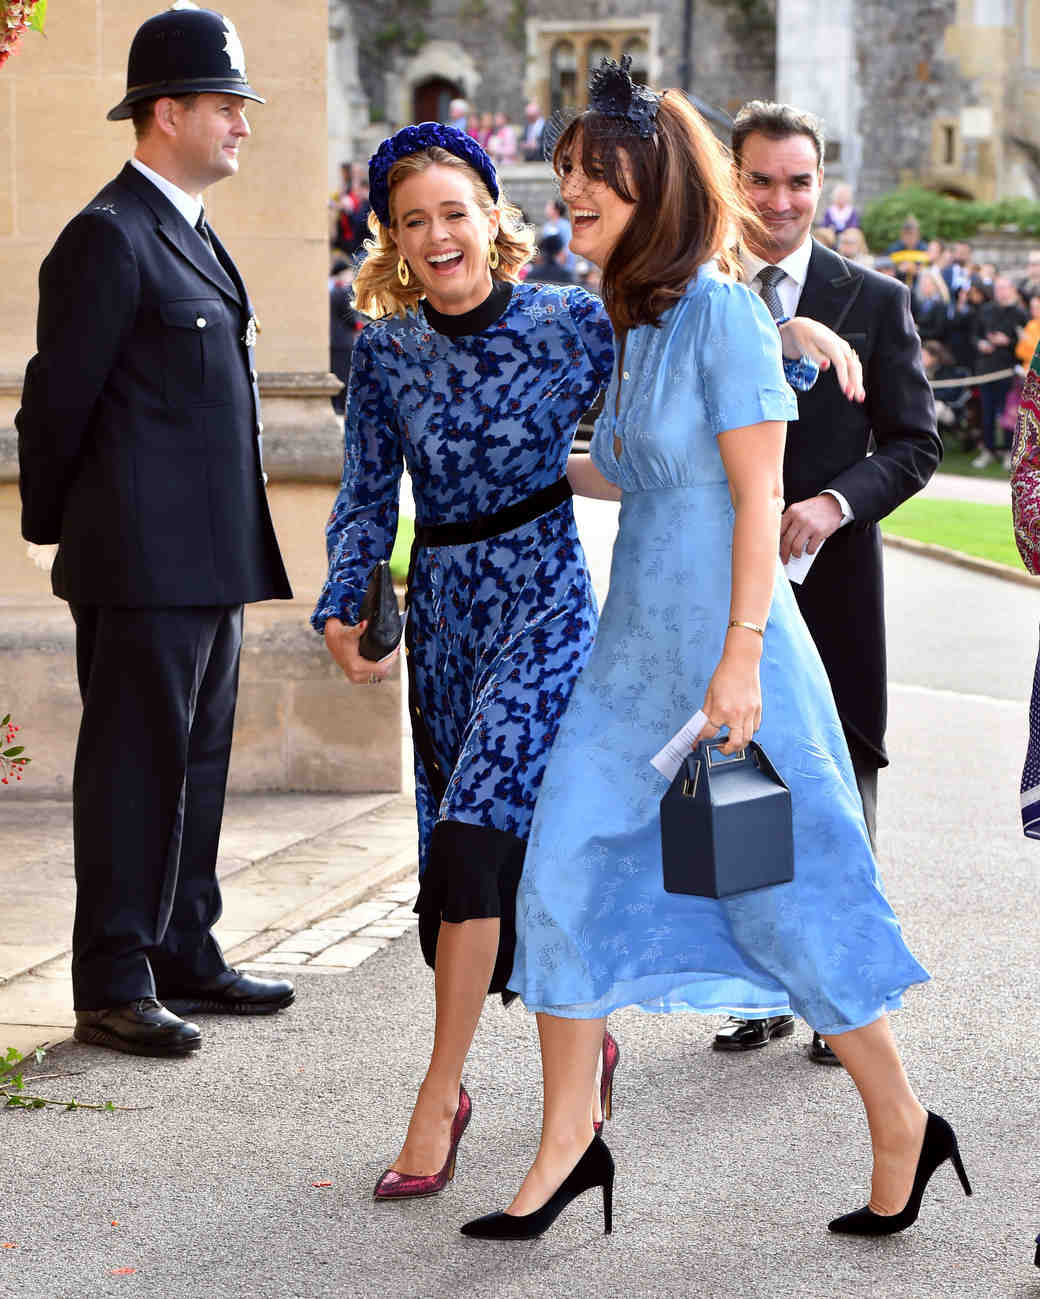 cressida bonas arrives at the royal wedding of princess eugenie